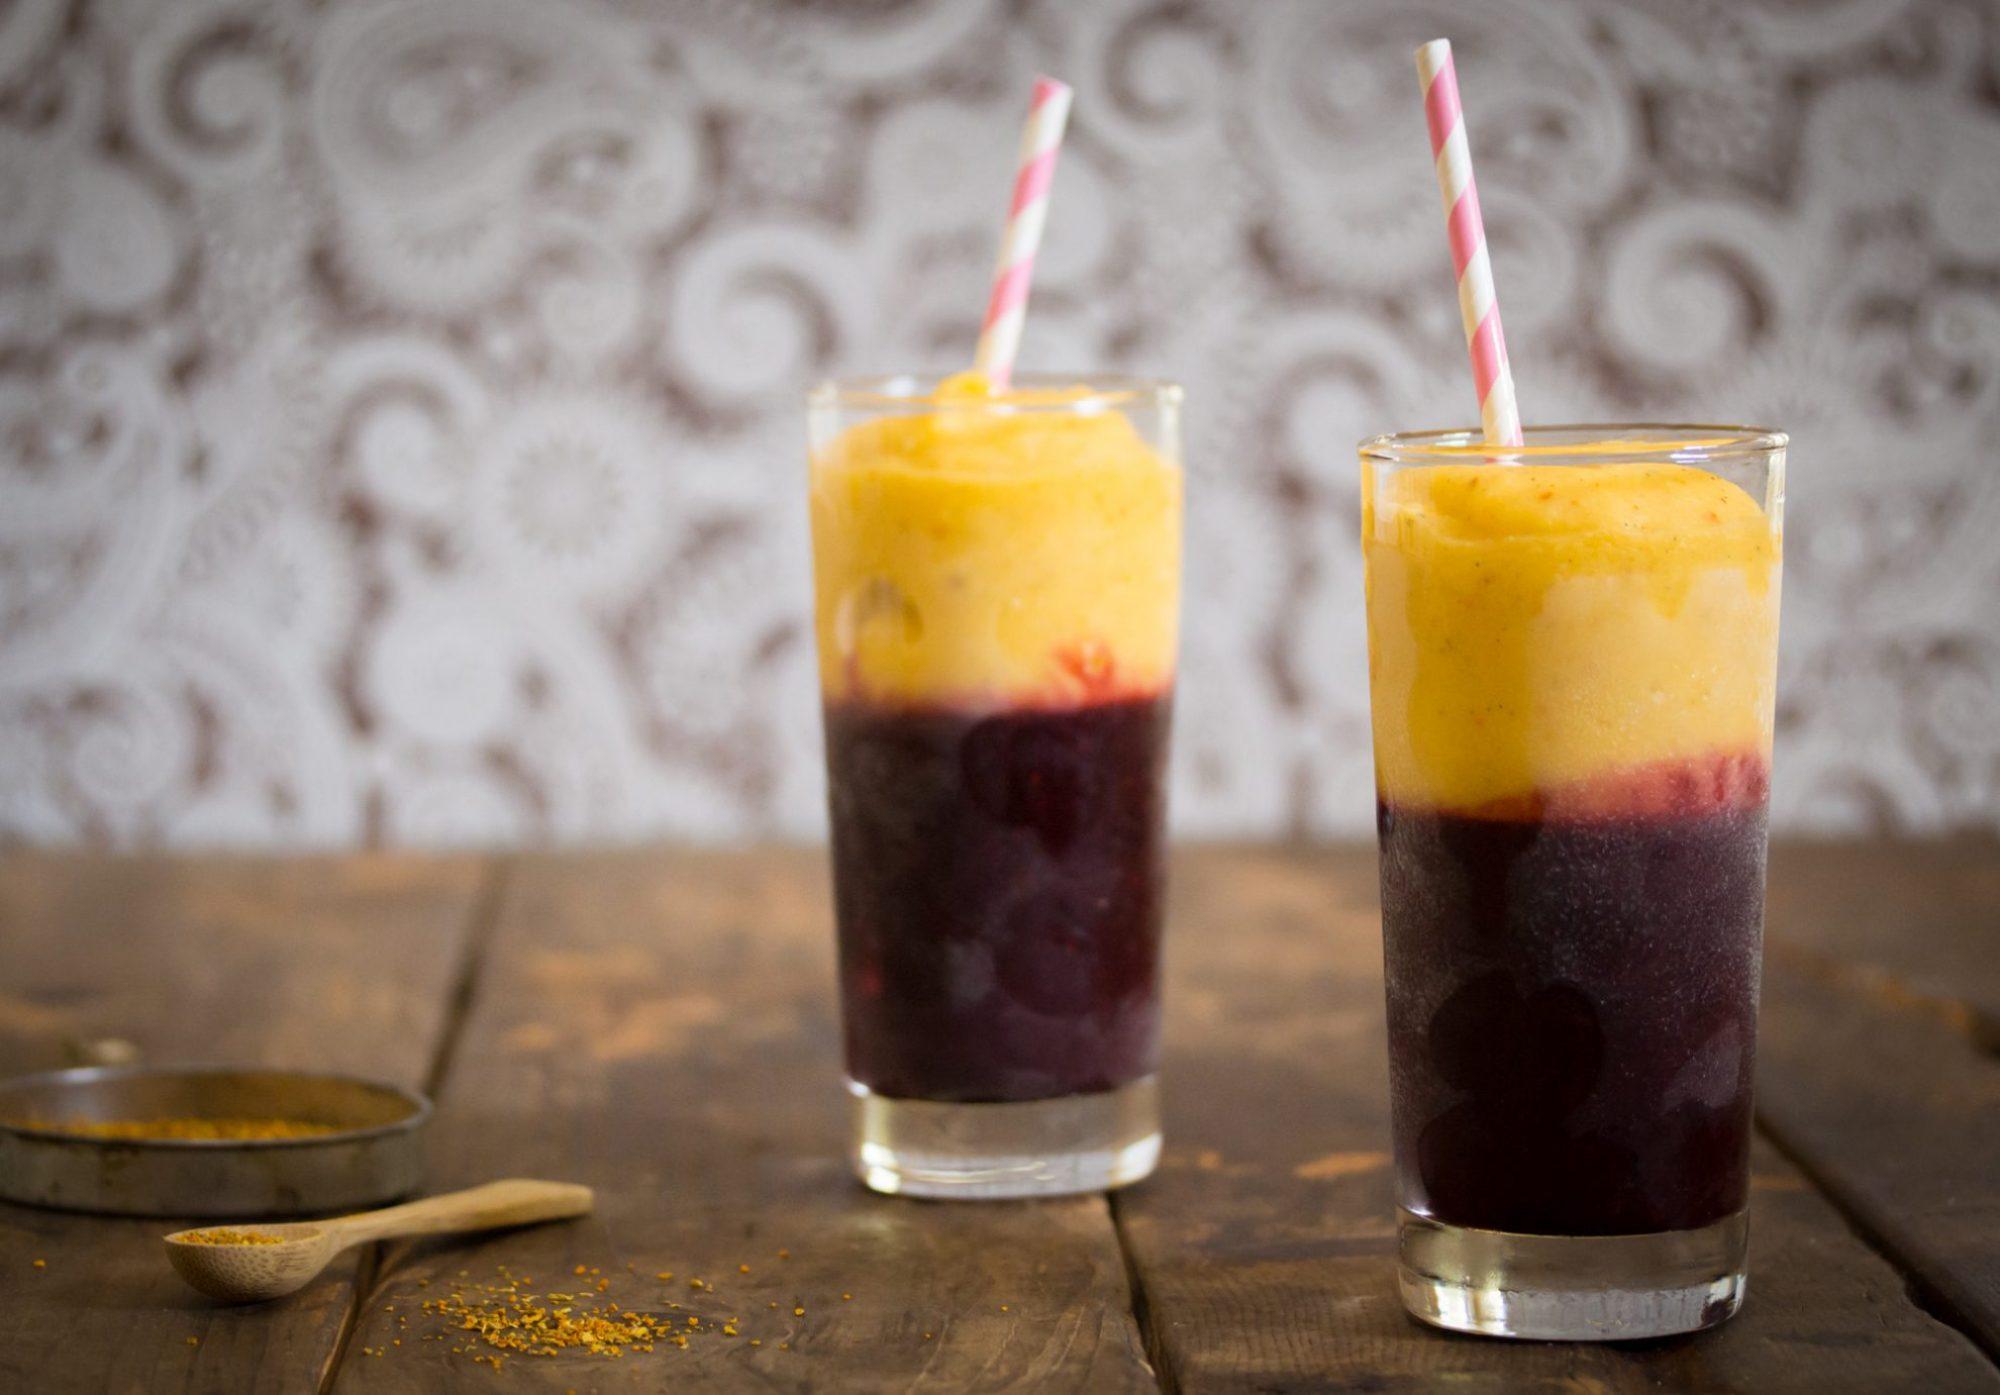 Berry & Mango Smoothie with Turmeric Tea Landscape